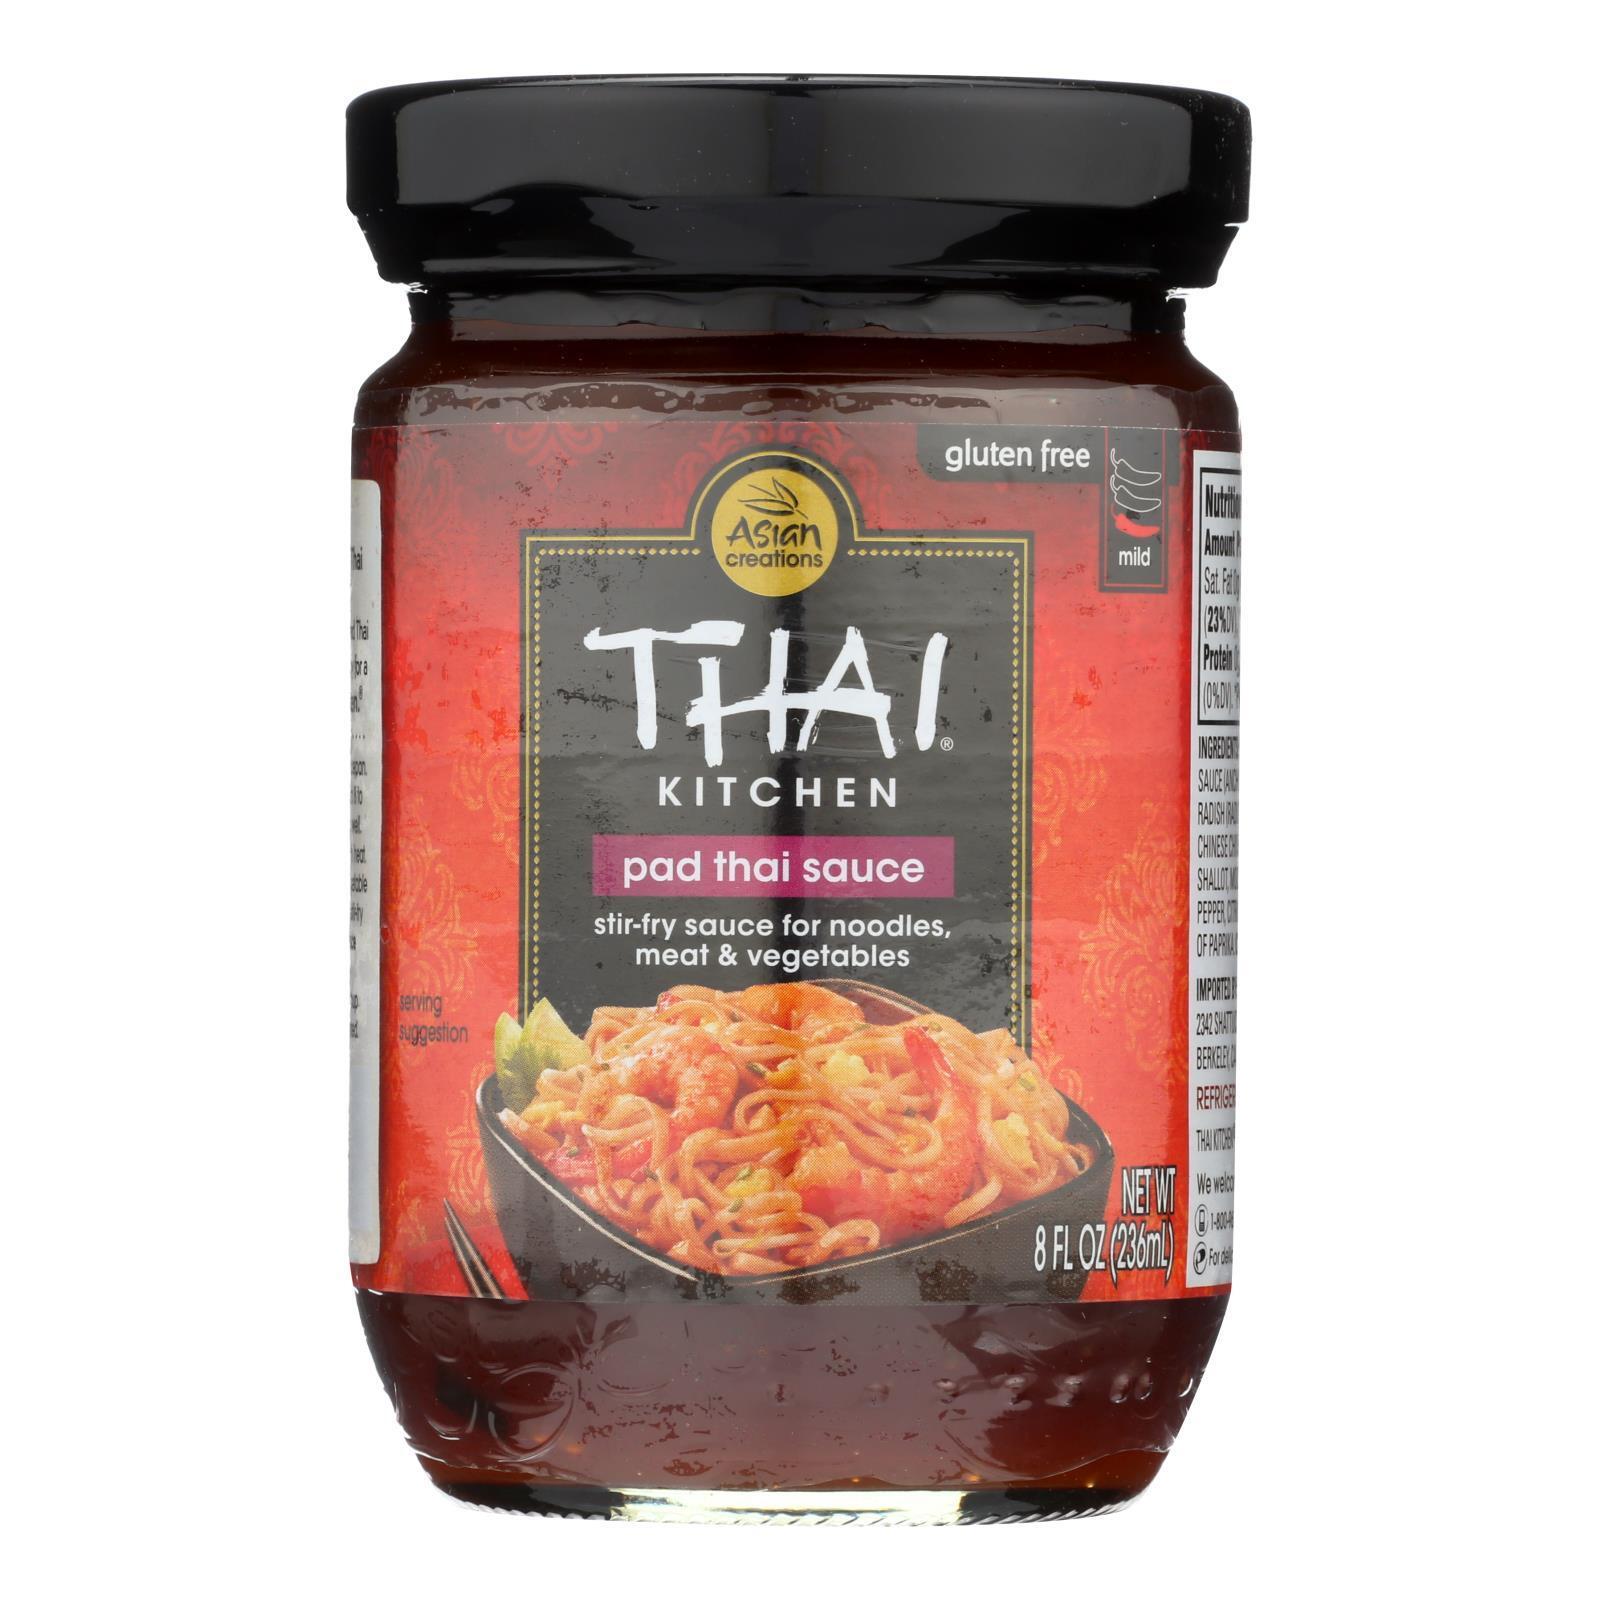 Thai Kitchen Original Pad Thai Sauce - Case of 12 - 8 Fl oz.